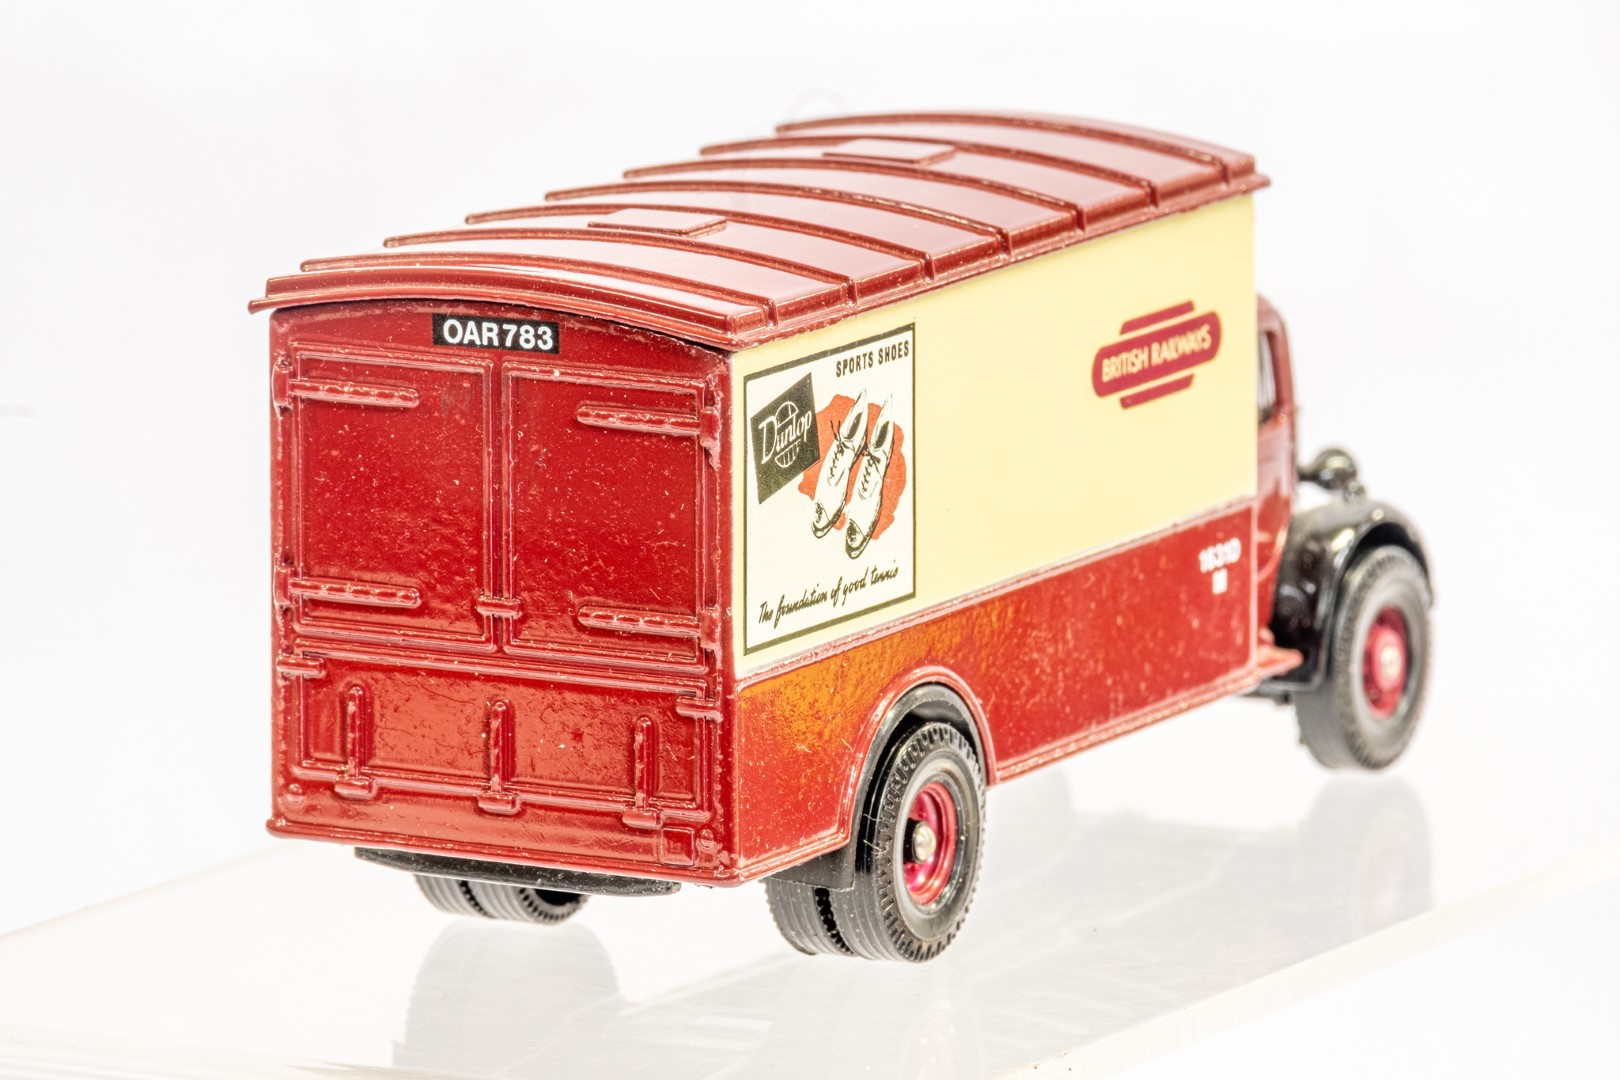 Corgi & Lledo 2 Boxed Models - Service Vans Of the 50's & 60's & Sentinel Ballast - Image 10 of 12